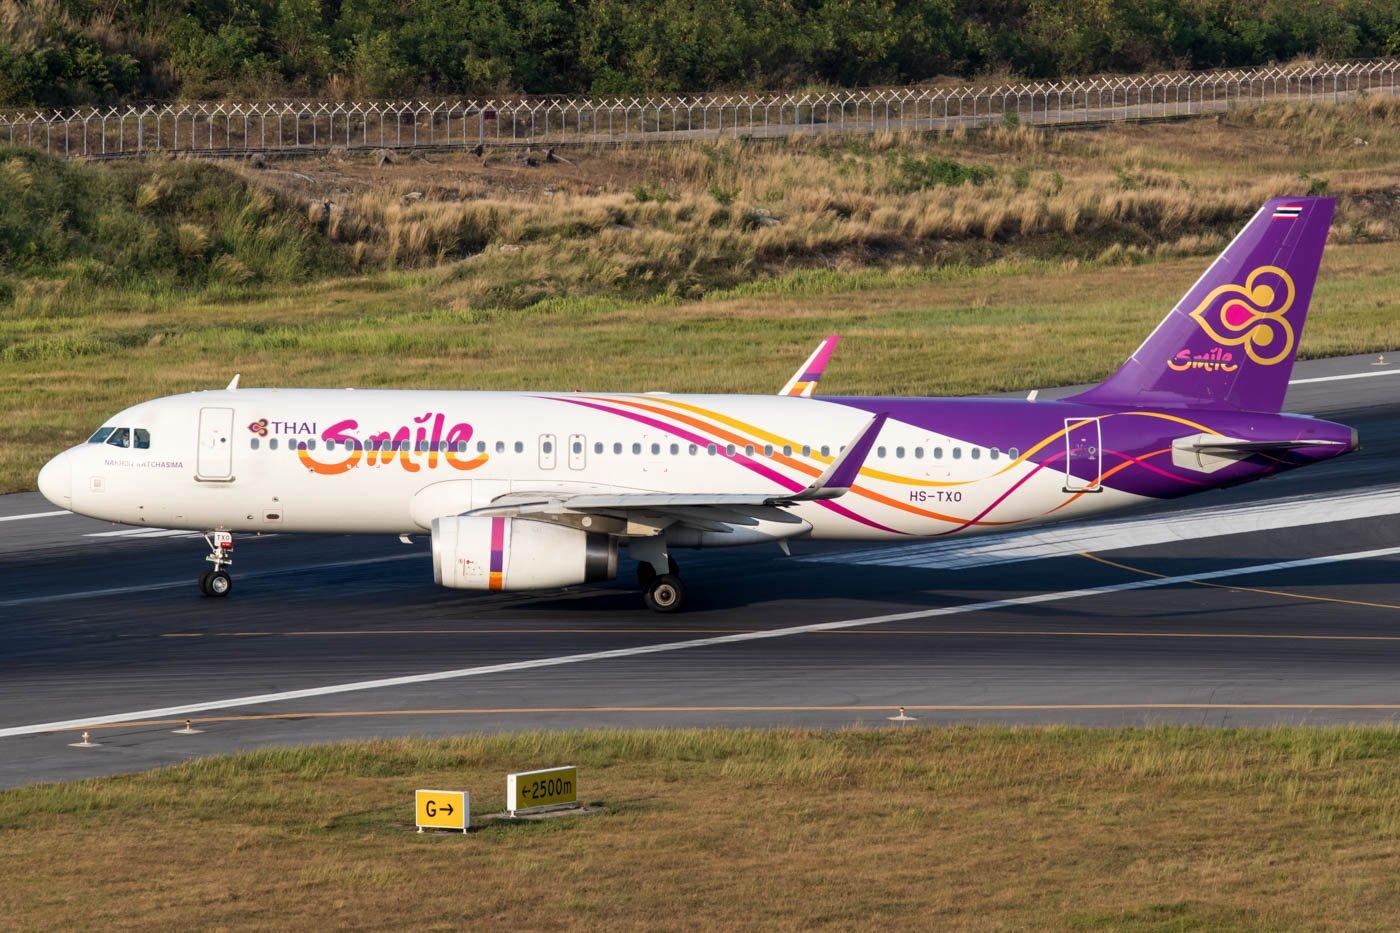 Thai Smile A320 at Phuket Airport